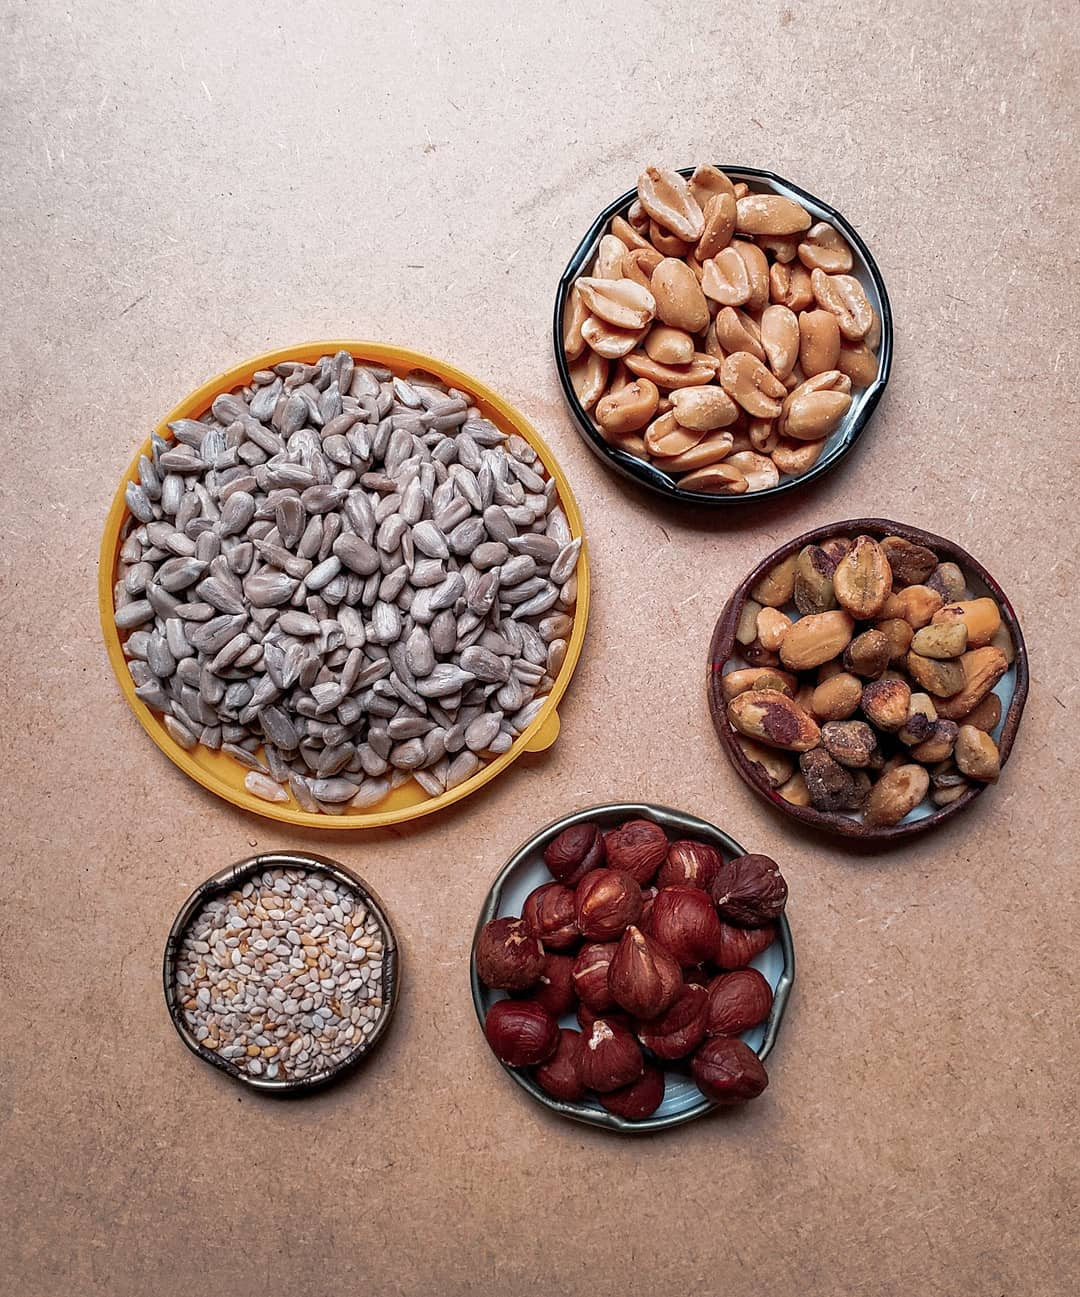 Semente de Girassol | Amendoim | Pistache | Avelã | Gergelim